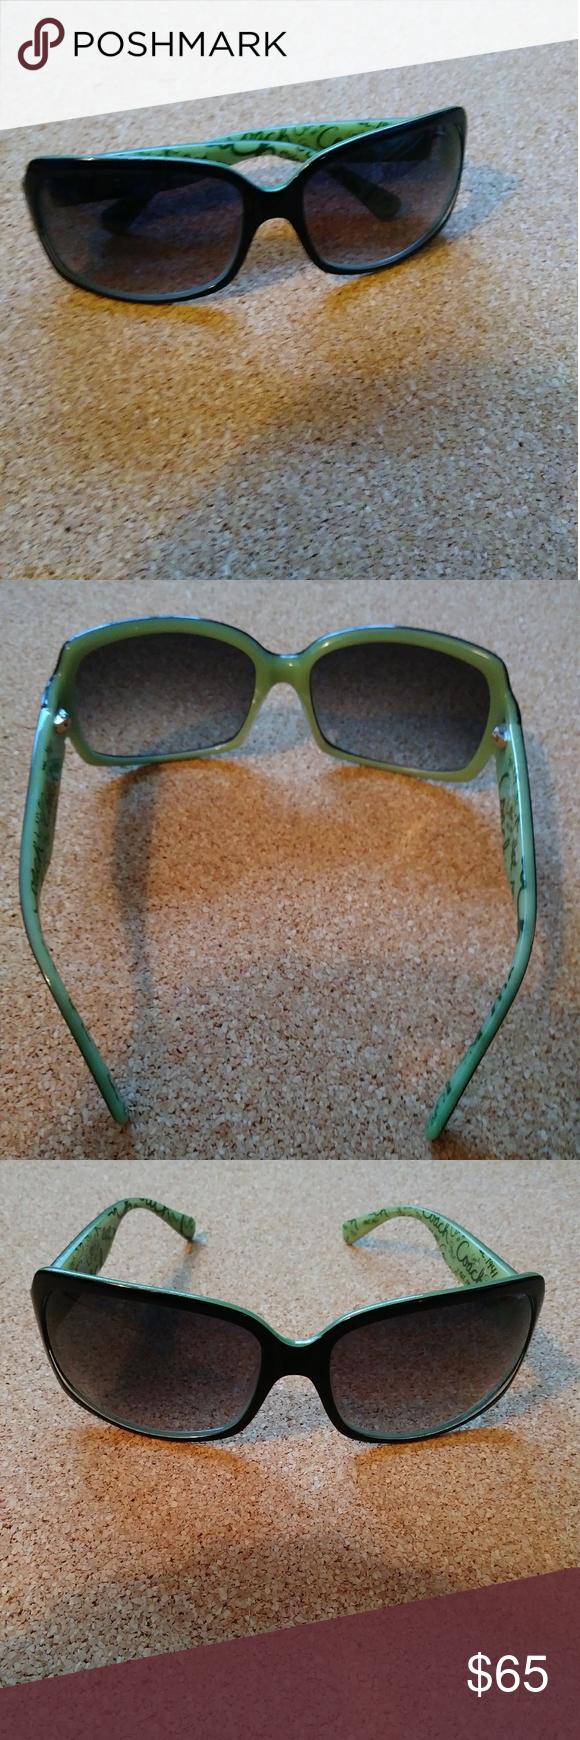 b38c06487cd51 Coach Sunglasses Coach sunglasses. Ginger. S496. Black with green trim.  Coach Accessories Sunglasses